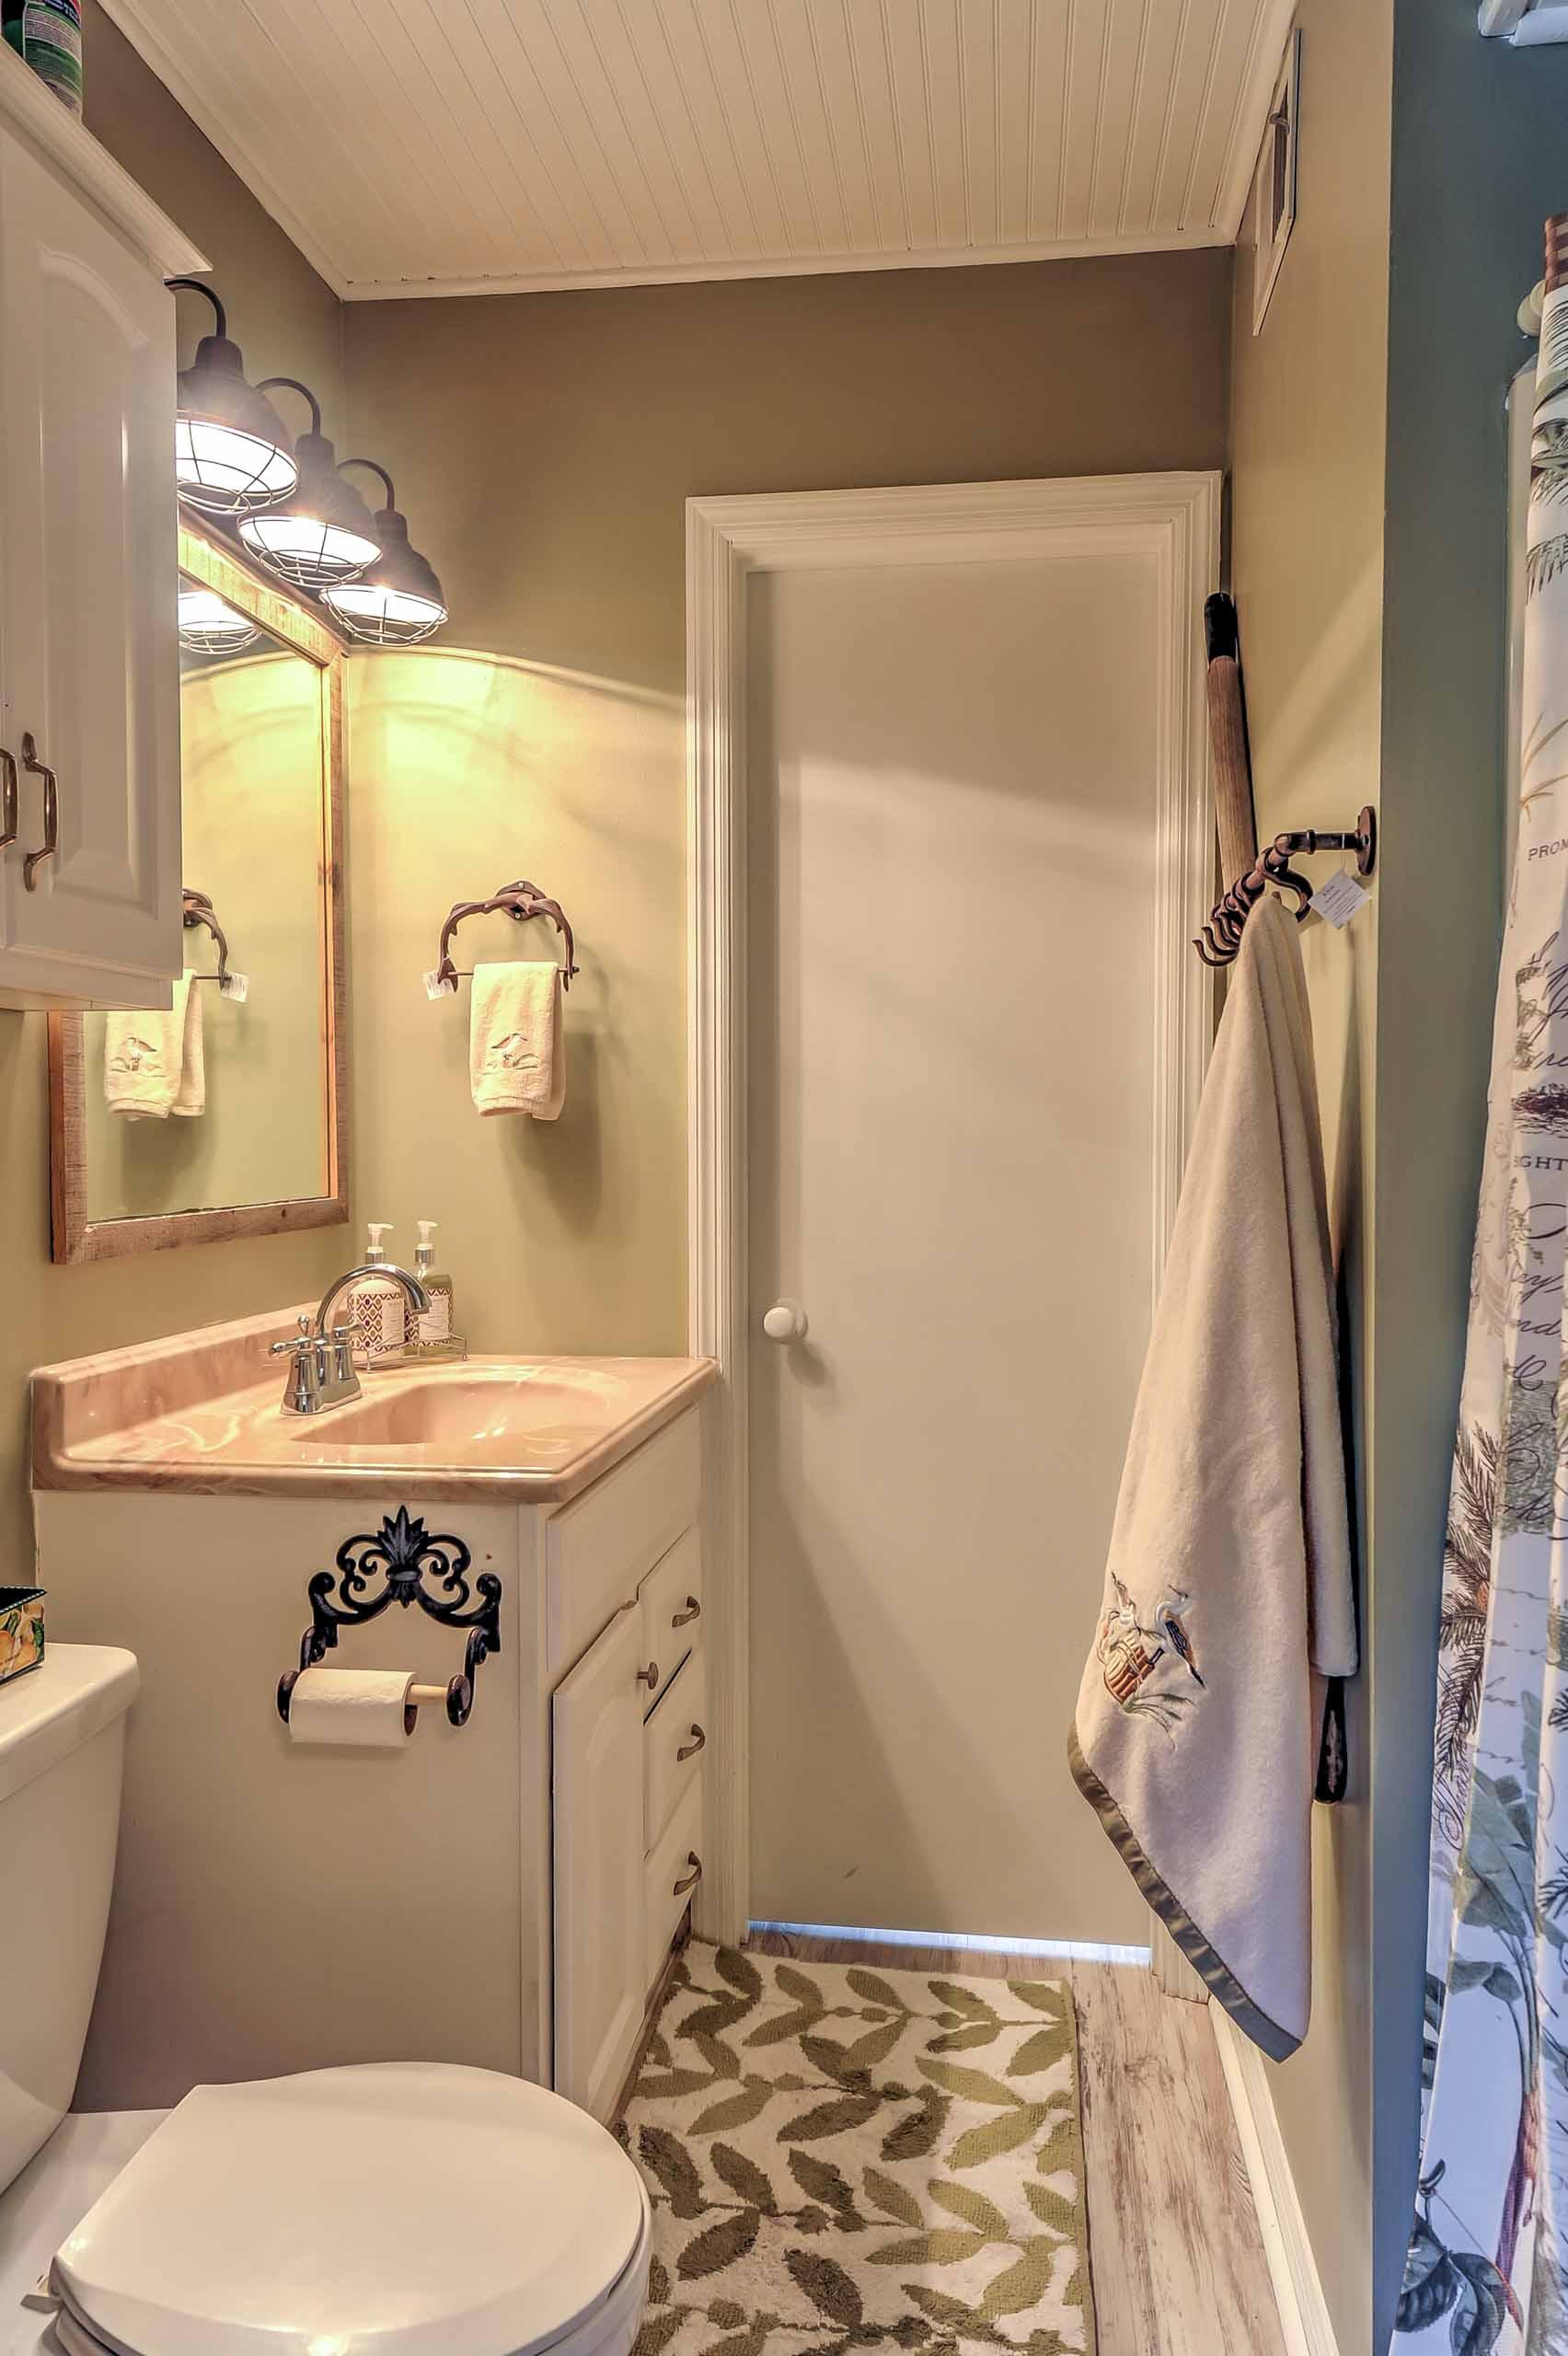 The en-suite bathroom provides maximum convenience and privacy.